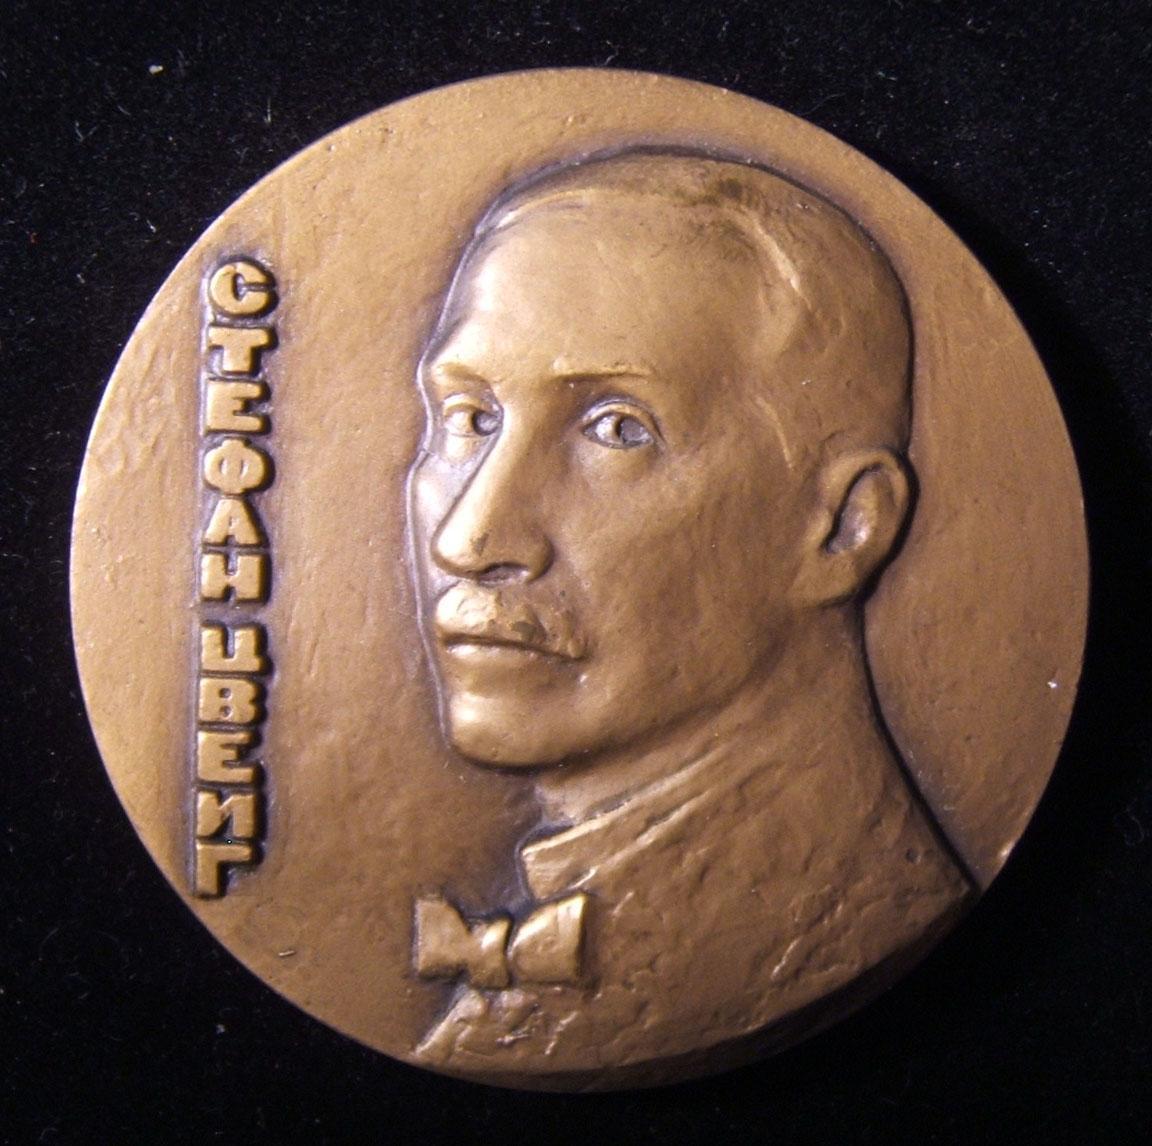 Russia/Soviet Union: Stefan Zweig birth centennary bronze medal by Joseph Ivanovitch Kozlovsky, 1981; size: 60mm; weight: 122.25g. Zweig was a Jewish-Austrian novelist, playwright,